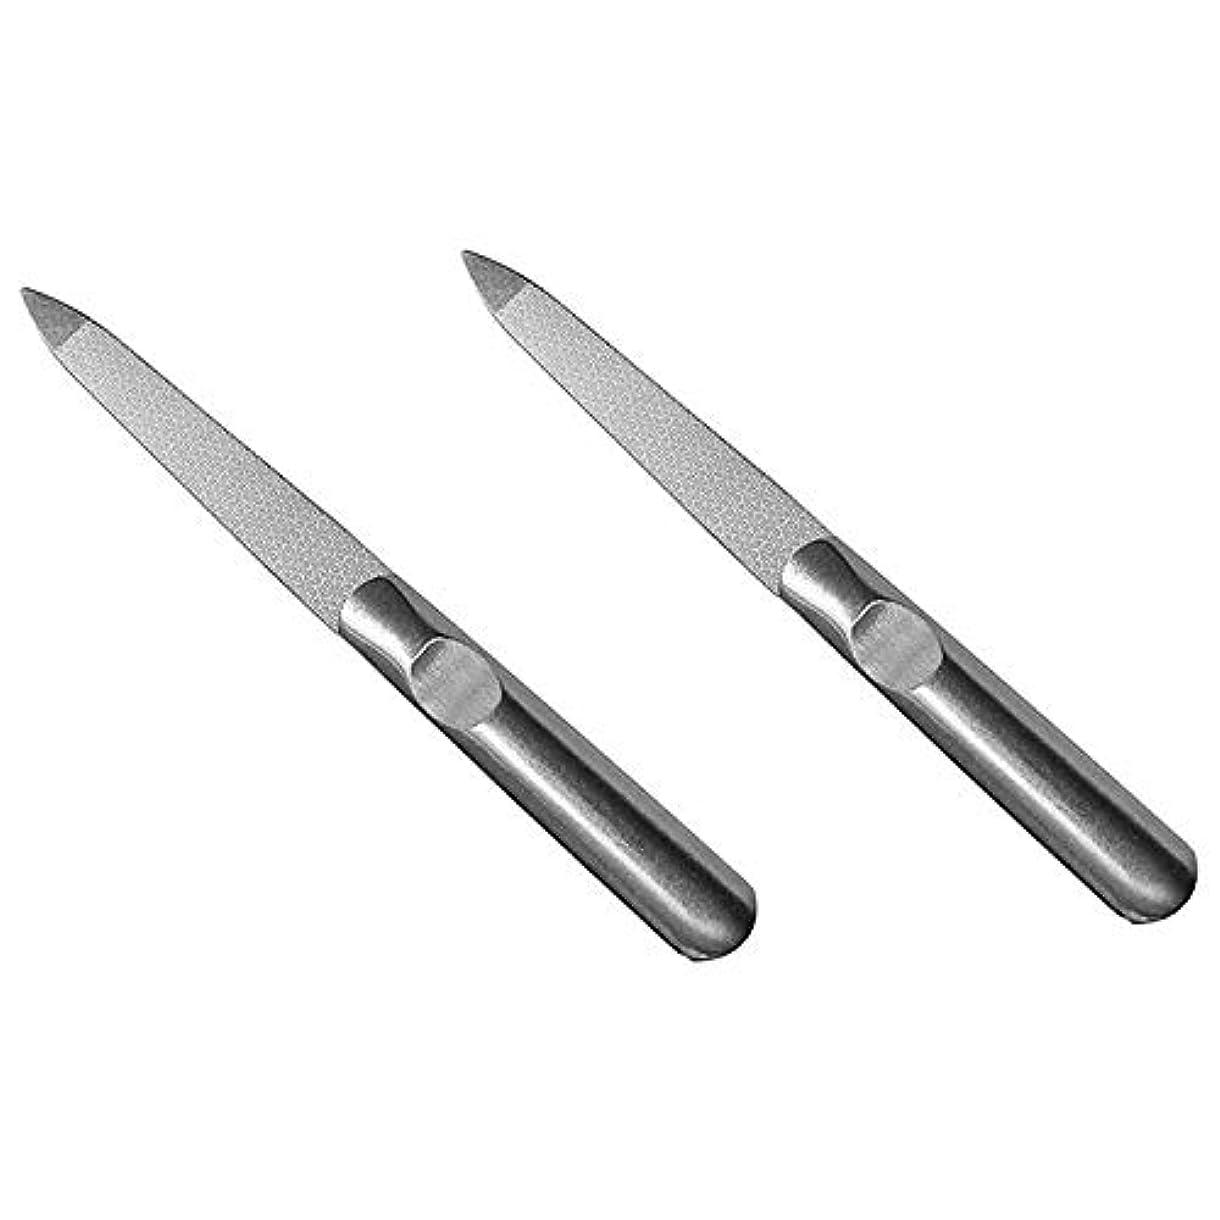 Semoic 2個 ステンレススチール ネイルファイル 両面マット アーマー美容ツール Yangjiang爪 腐食の防止鎧